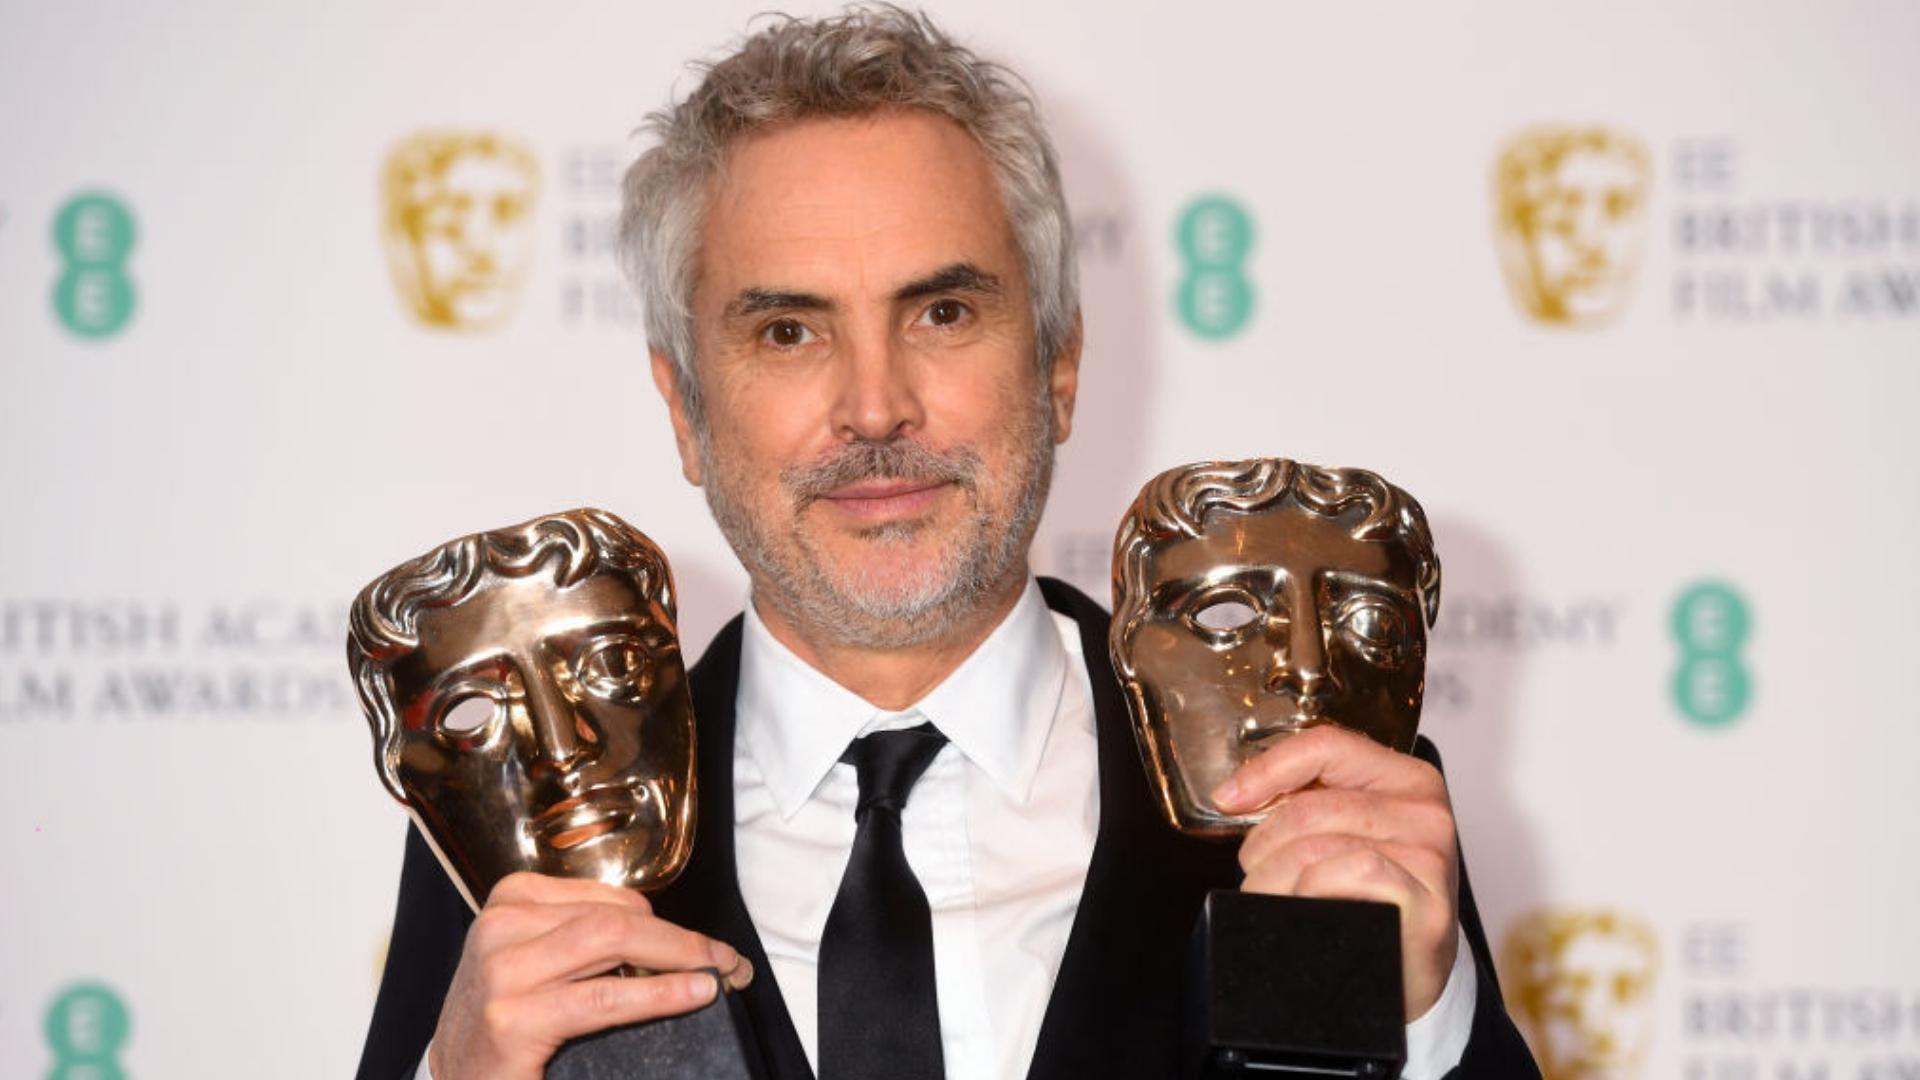 Roma triunfa en los BAFTA